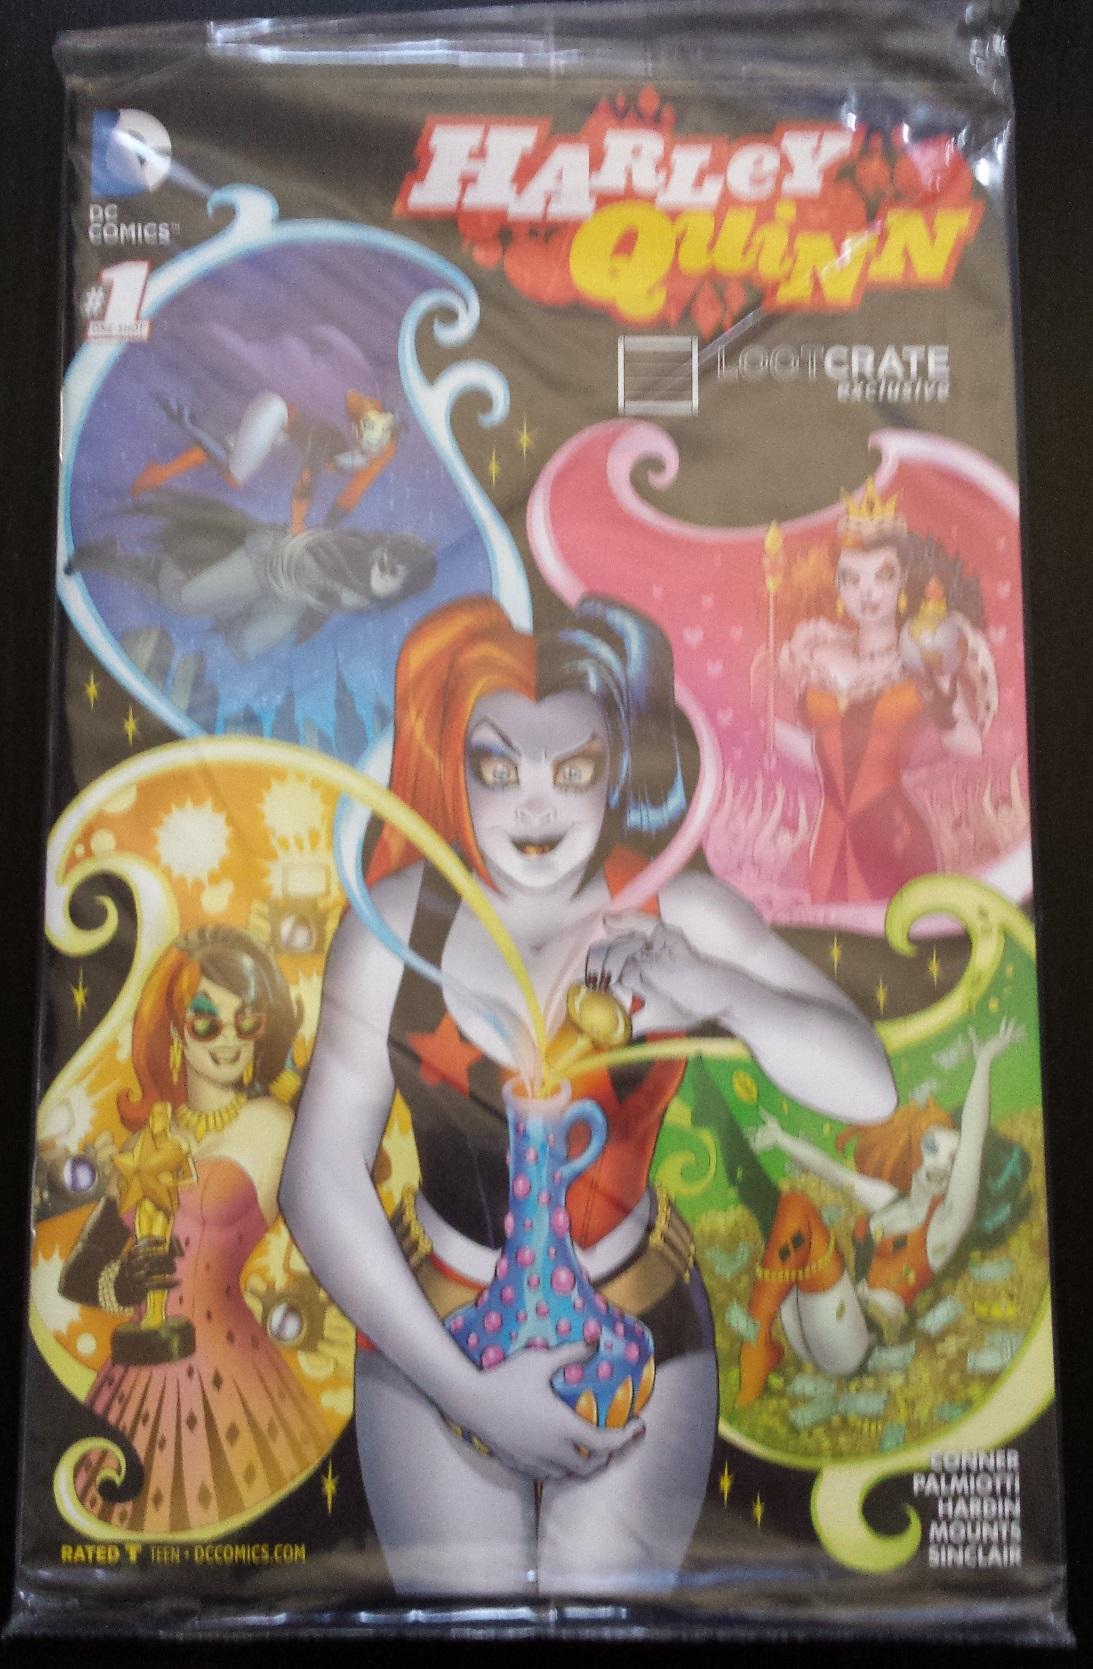 Exclusive comic book, harley quinn, loot crate march 2016, versus